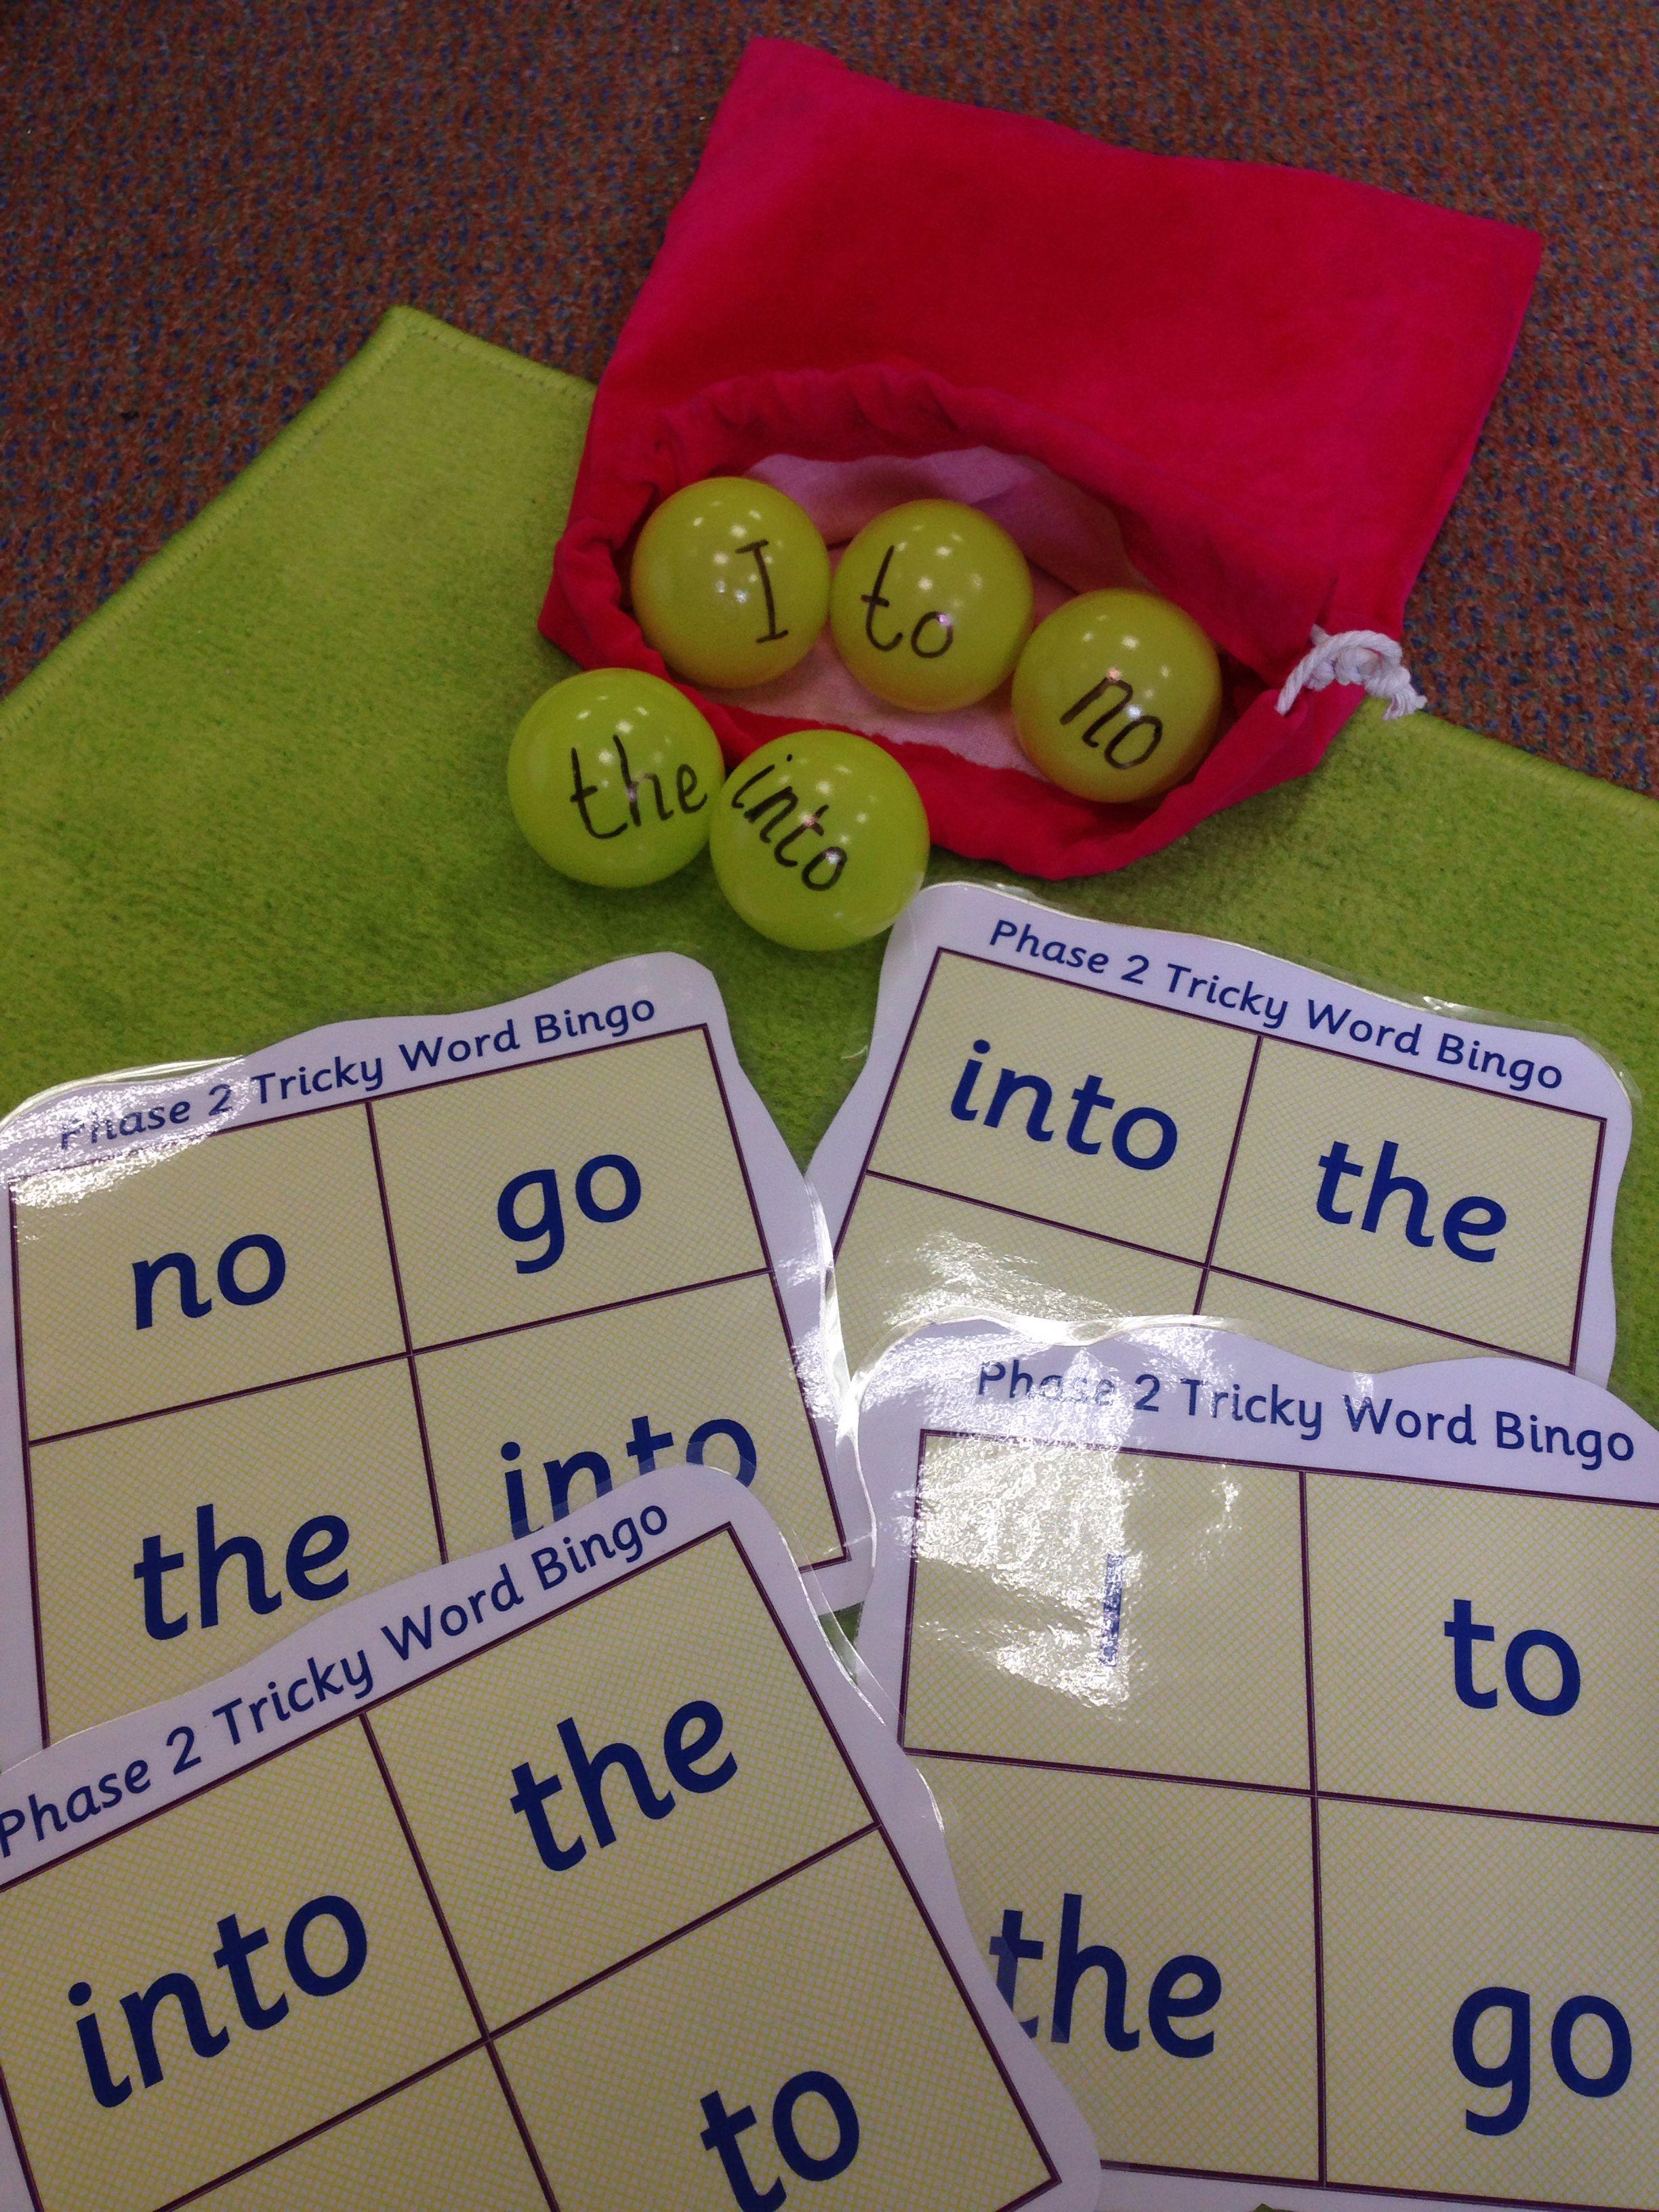 Phase 2 Tricky Word Bingo Game